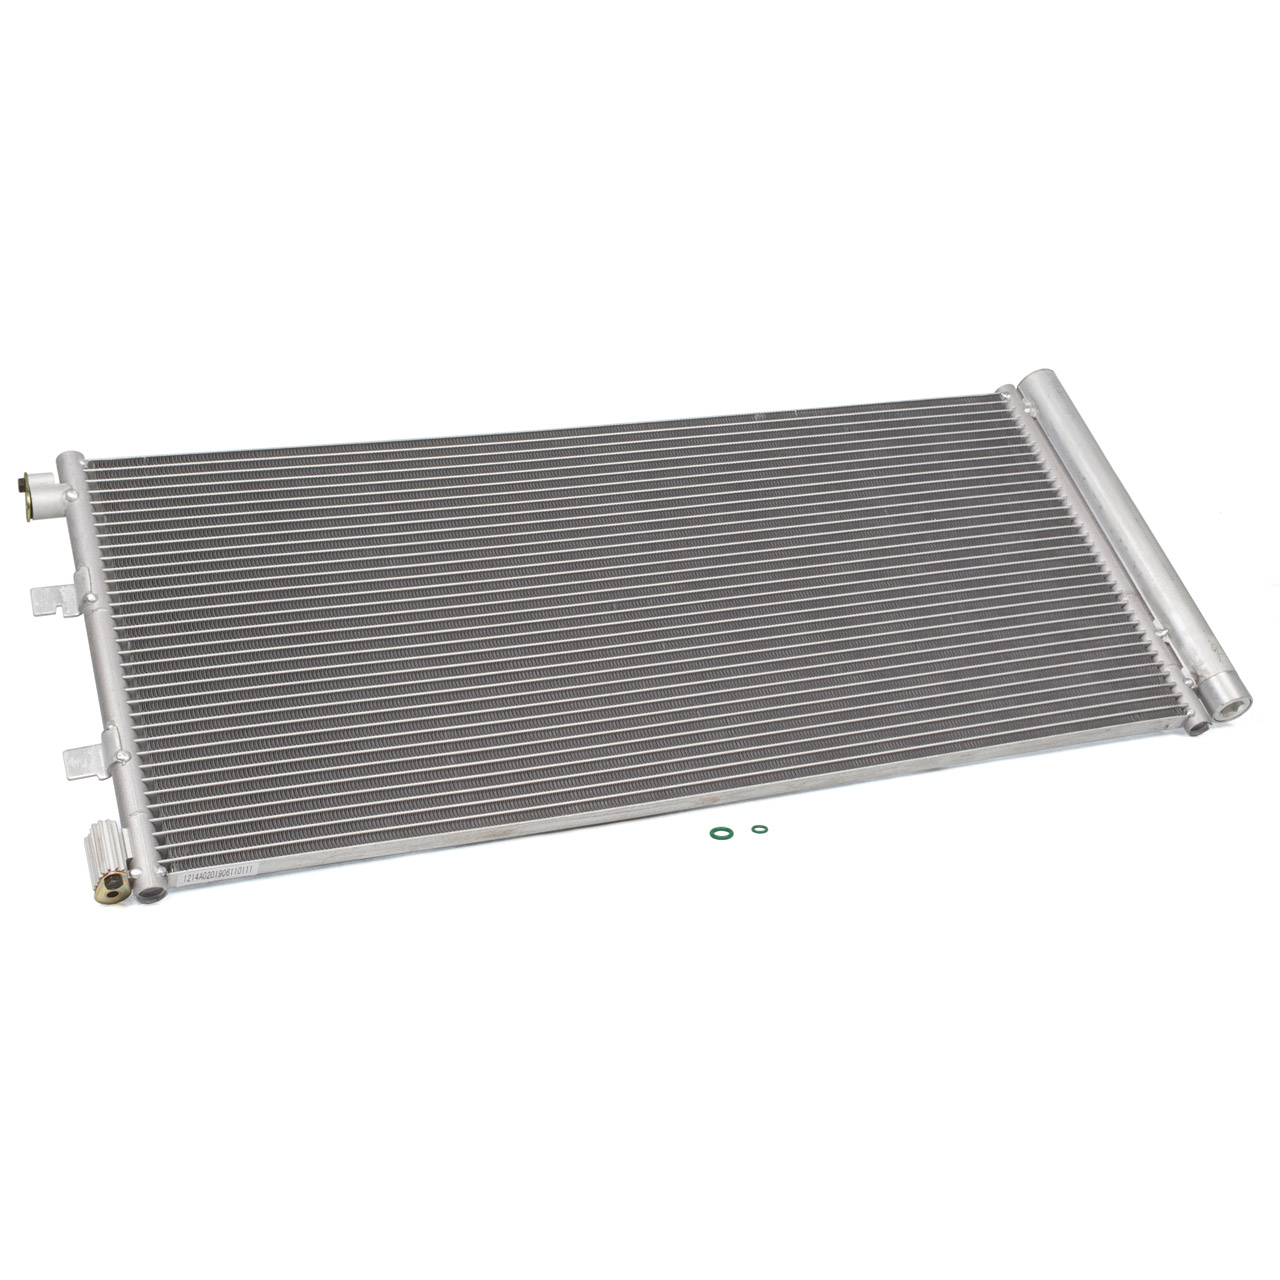 NRF 35972 EASY FIT Kondensator OPEL Movano B X62 RENAULT Master 3 2.3 Diesel NISSAN NV400